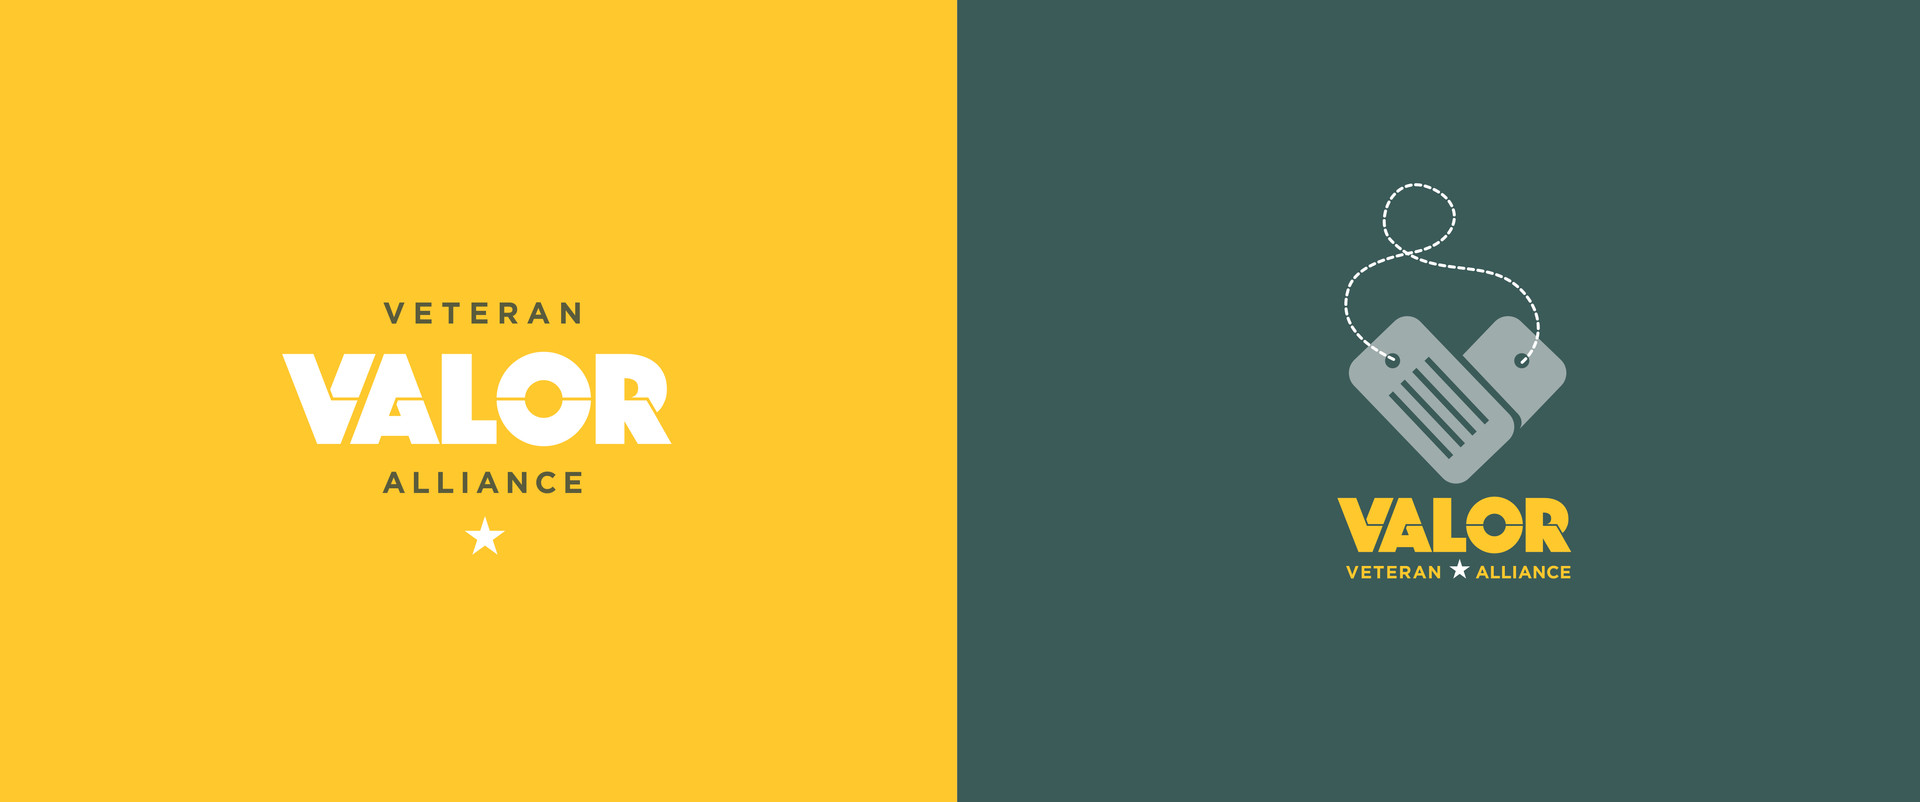 Valor Logo Designs